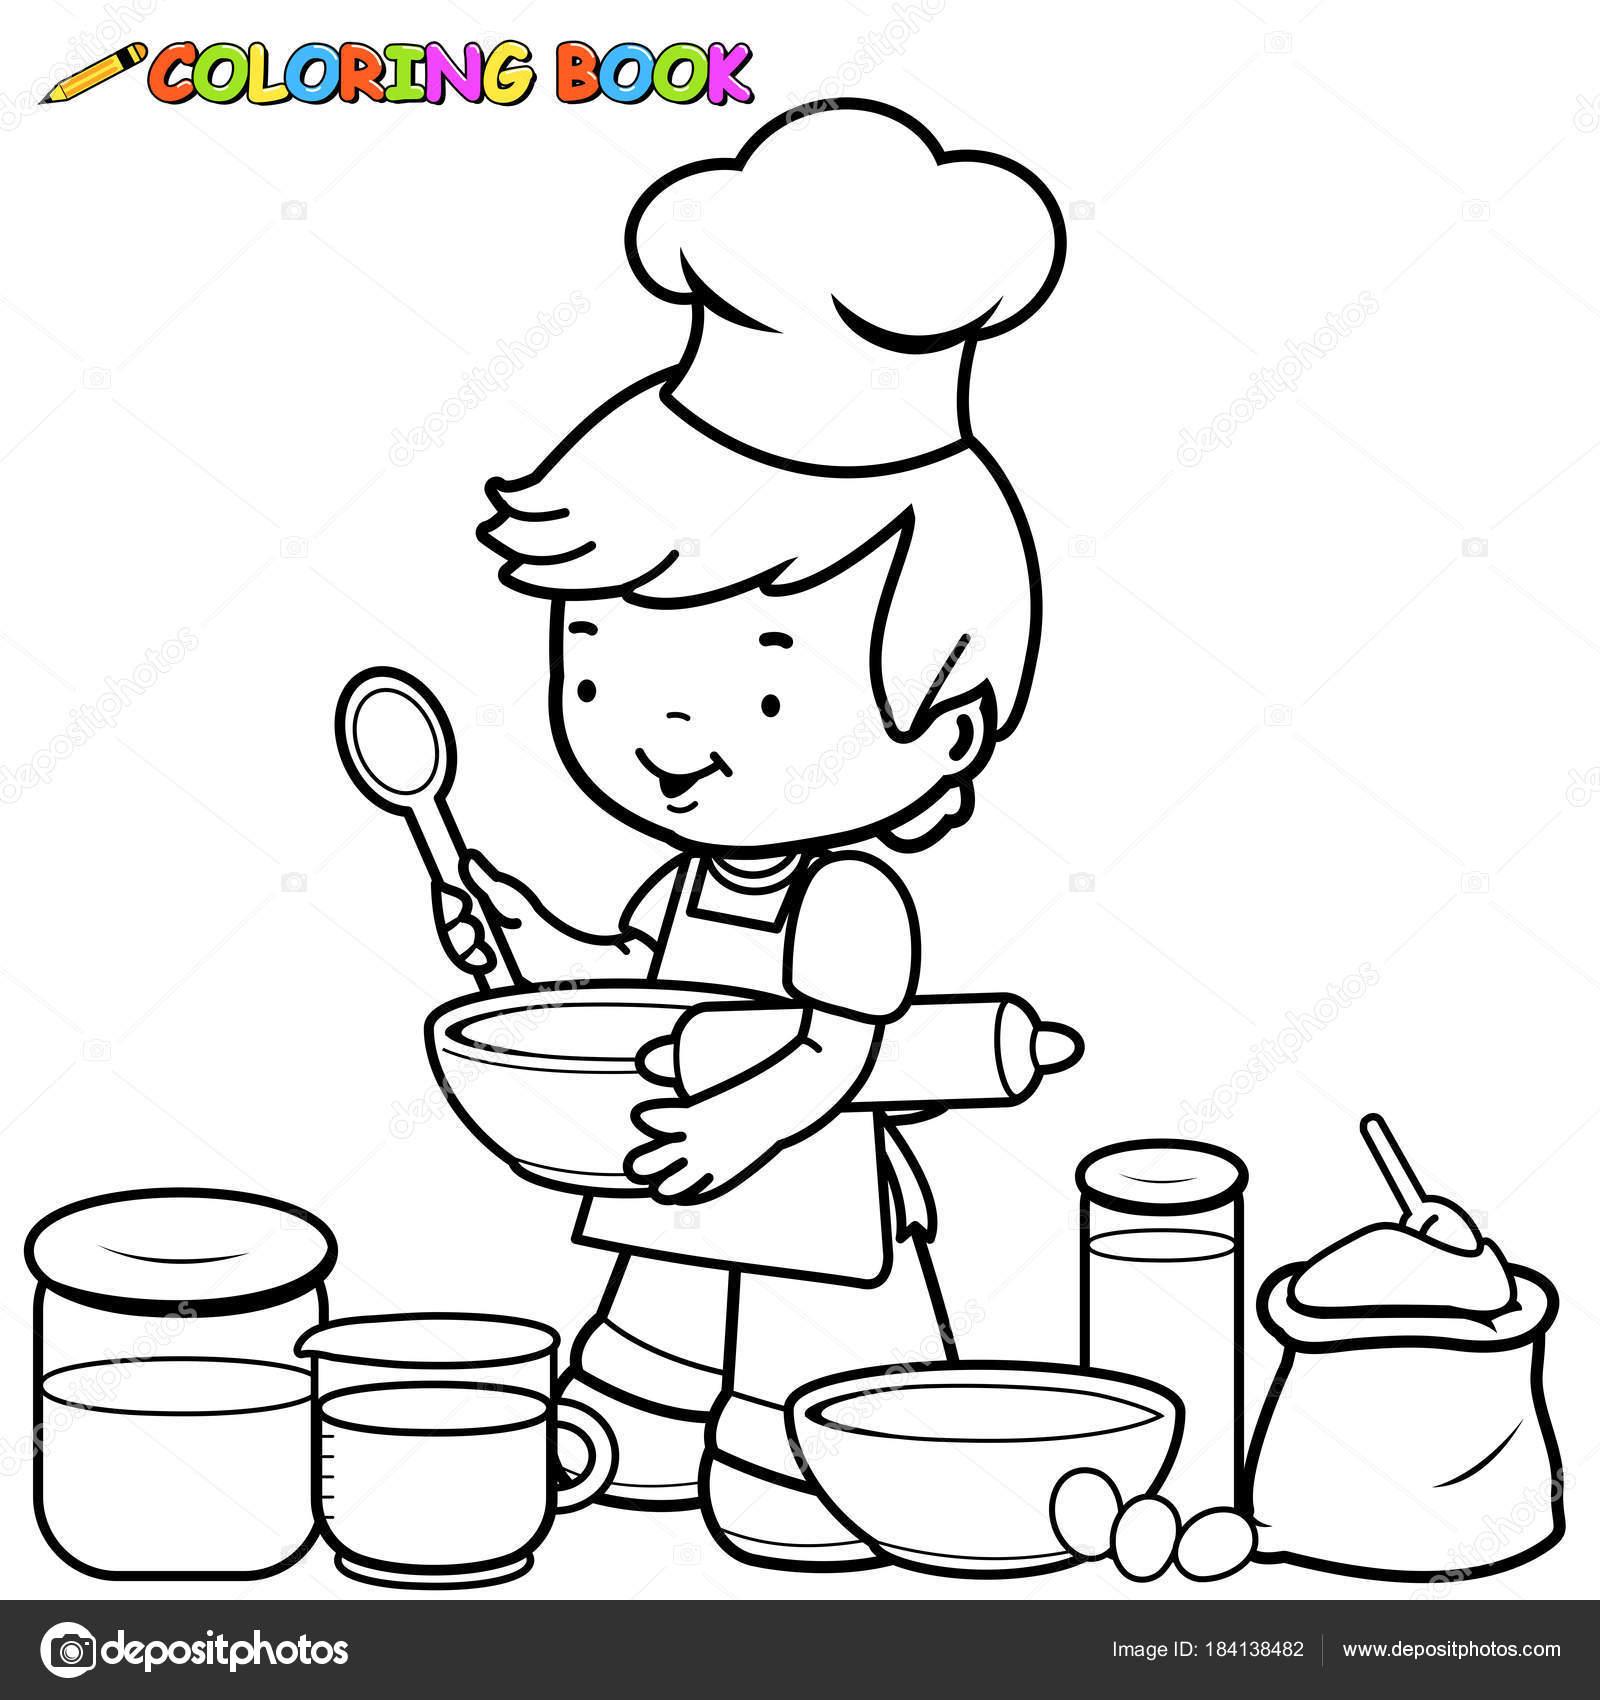 K k ocuk pi irmeye haz rlan yor boyama kitab sayfas for Programas de dibujo de cocinas gratis